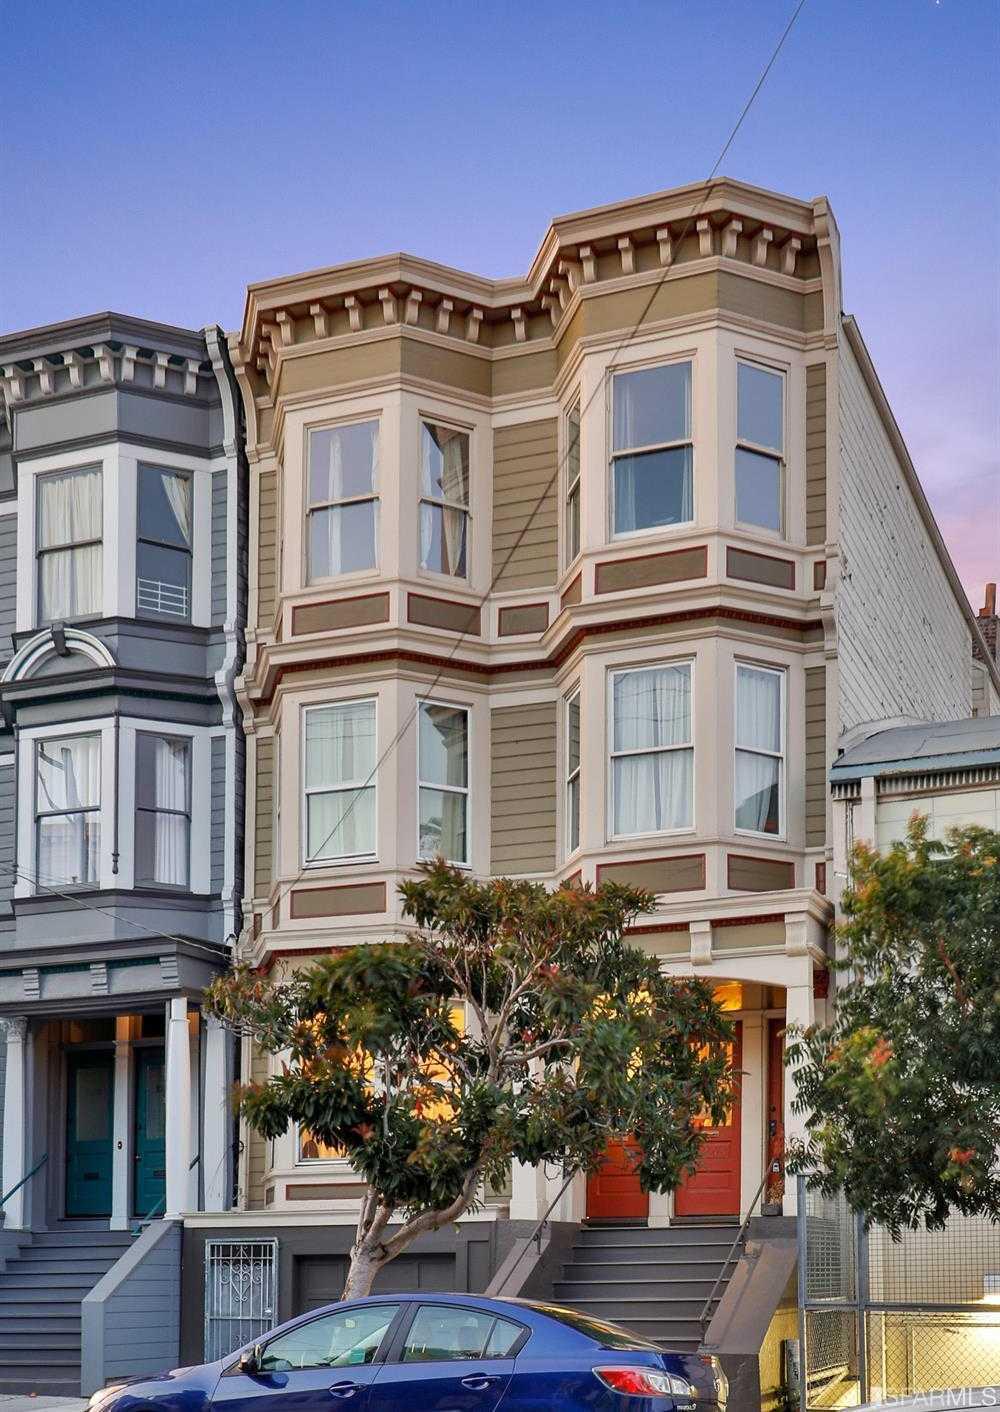 3268 20th St # H San Francisco, CA 94110